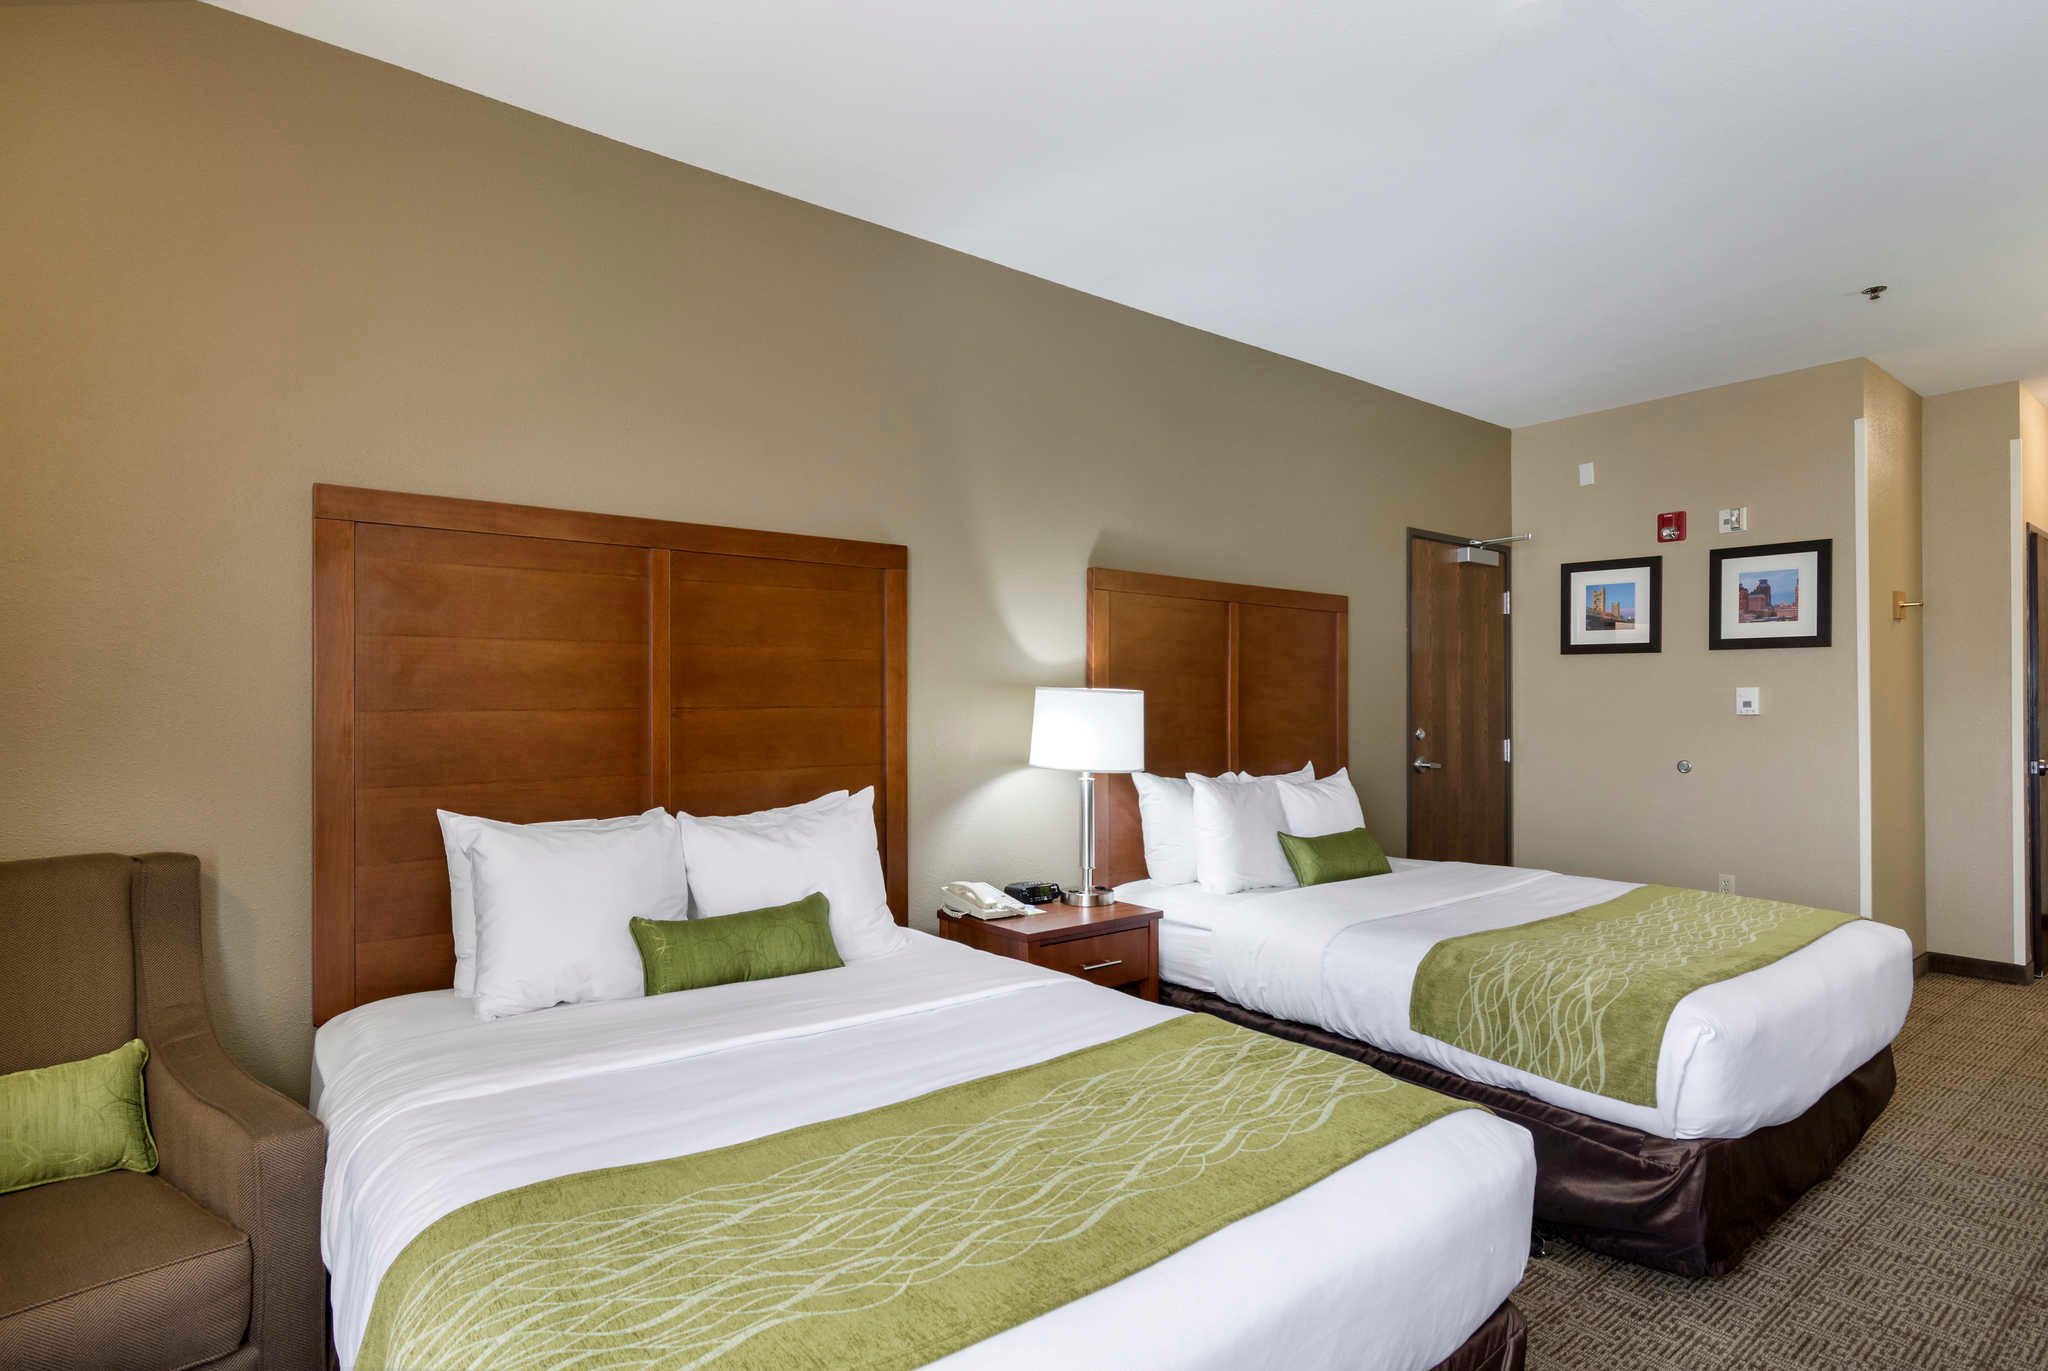 Comfort Inn & Suites Sacramento - University Area image 17